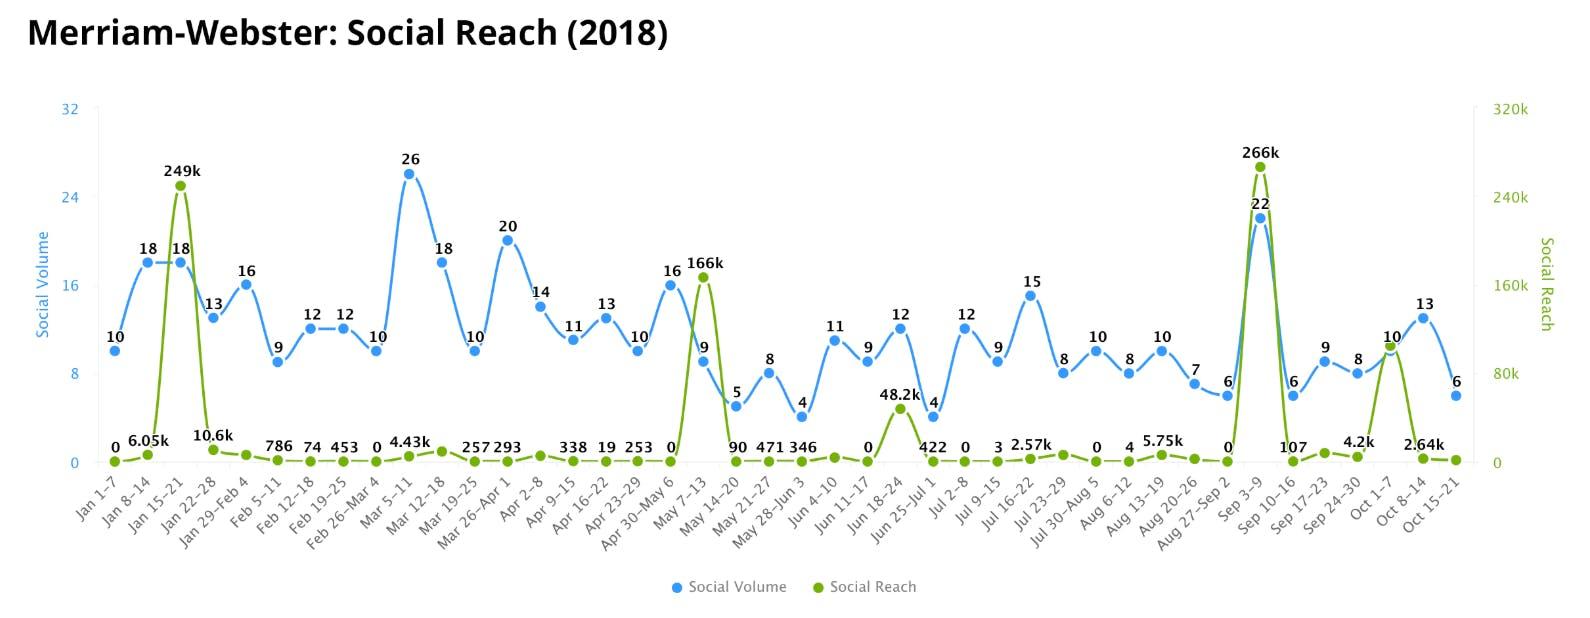 Merriam webster analysis social reach